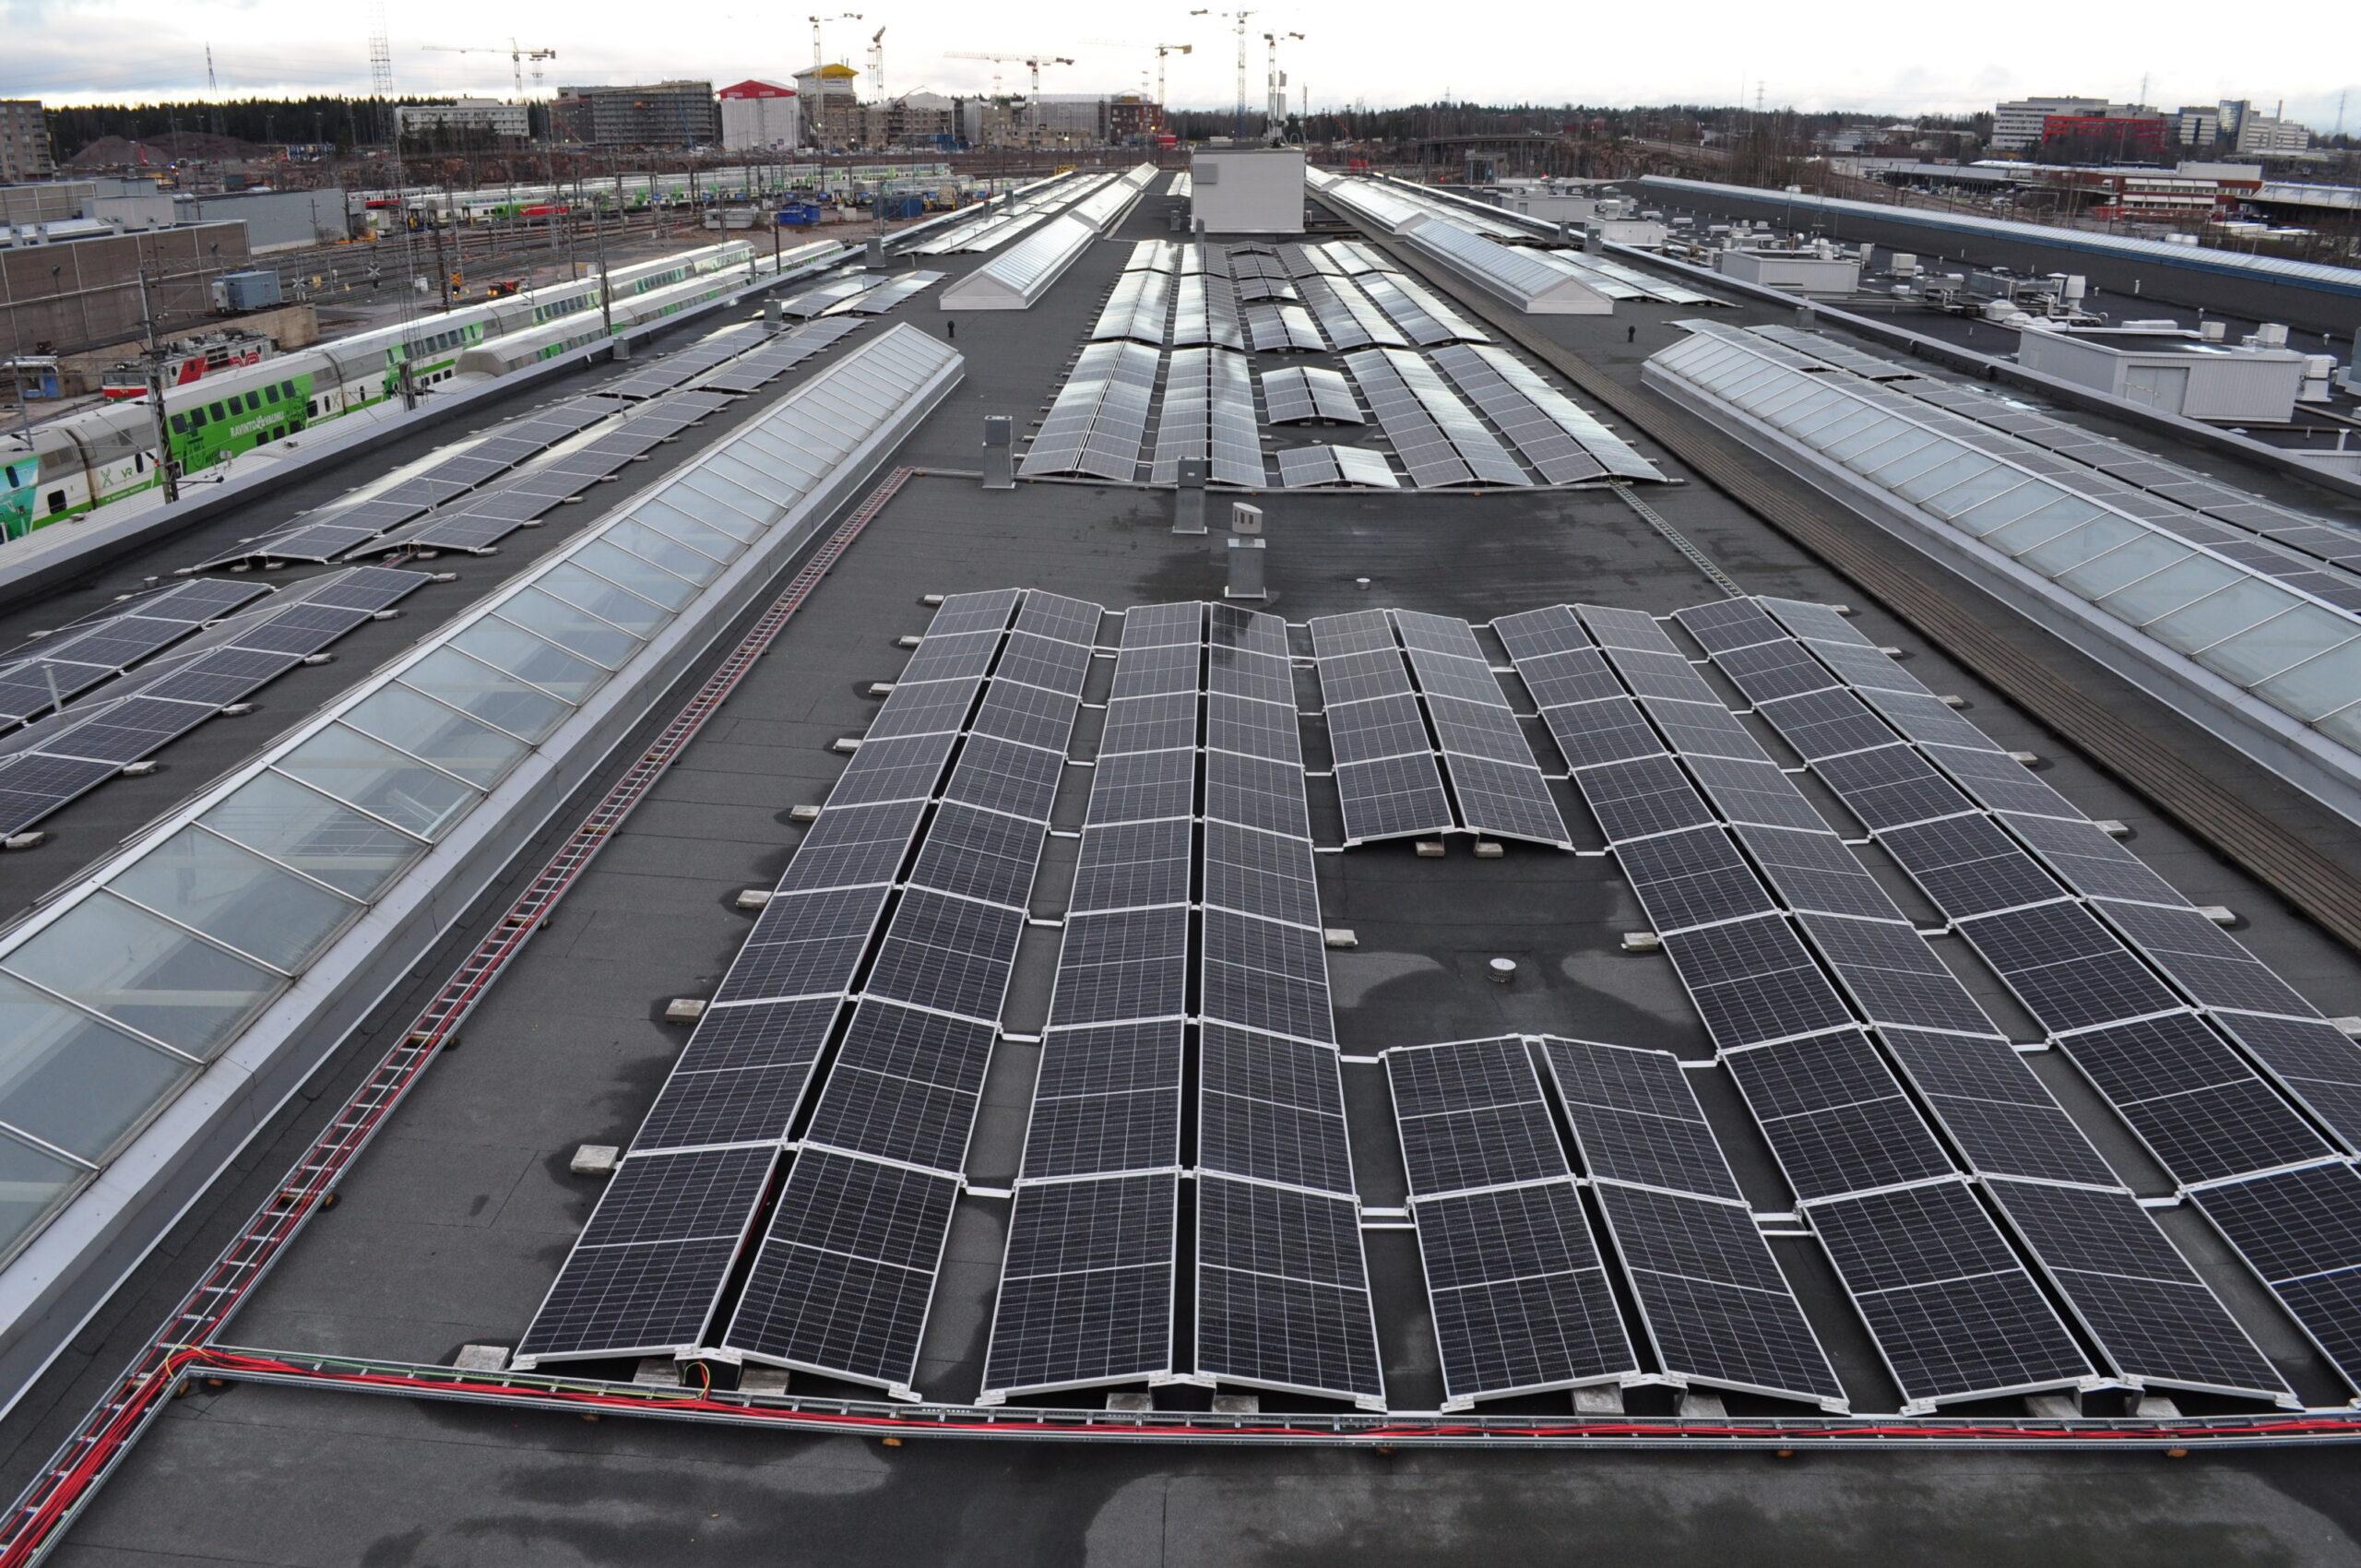 New solar panels on the roof of VR's Helsinki depot, Pendolino Hall